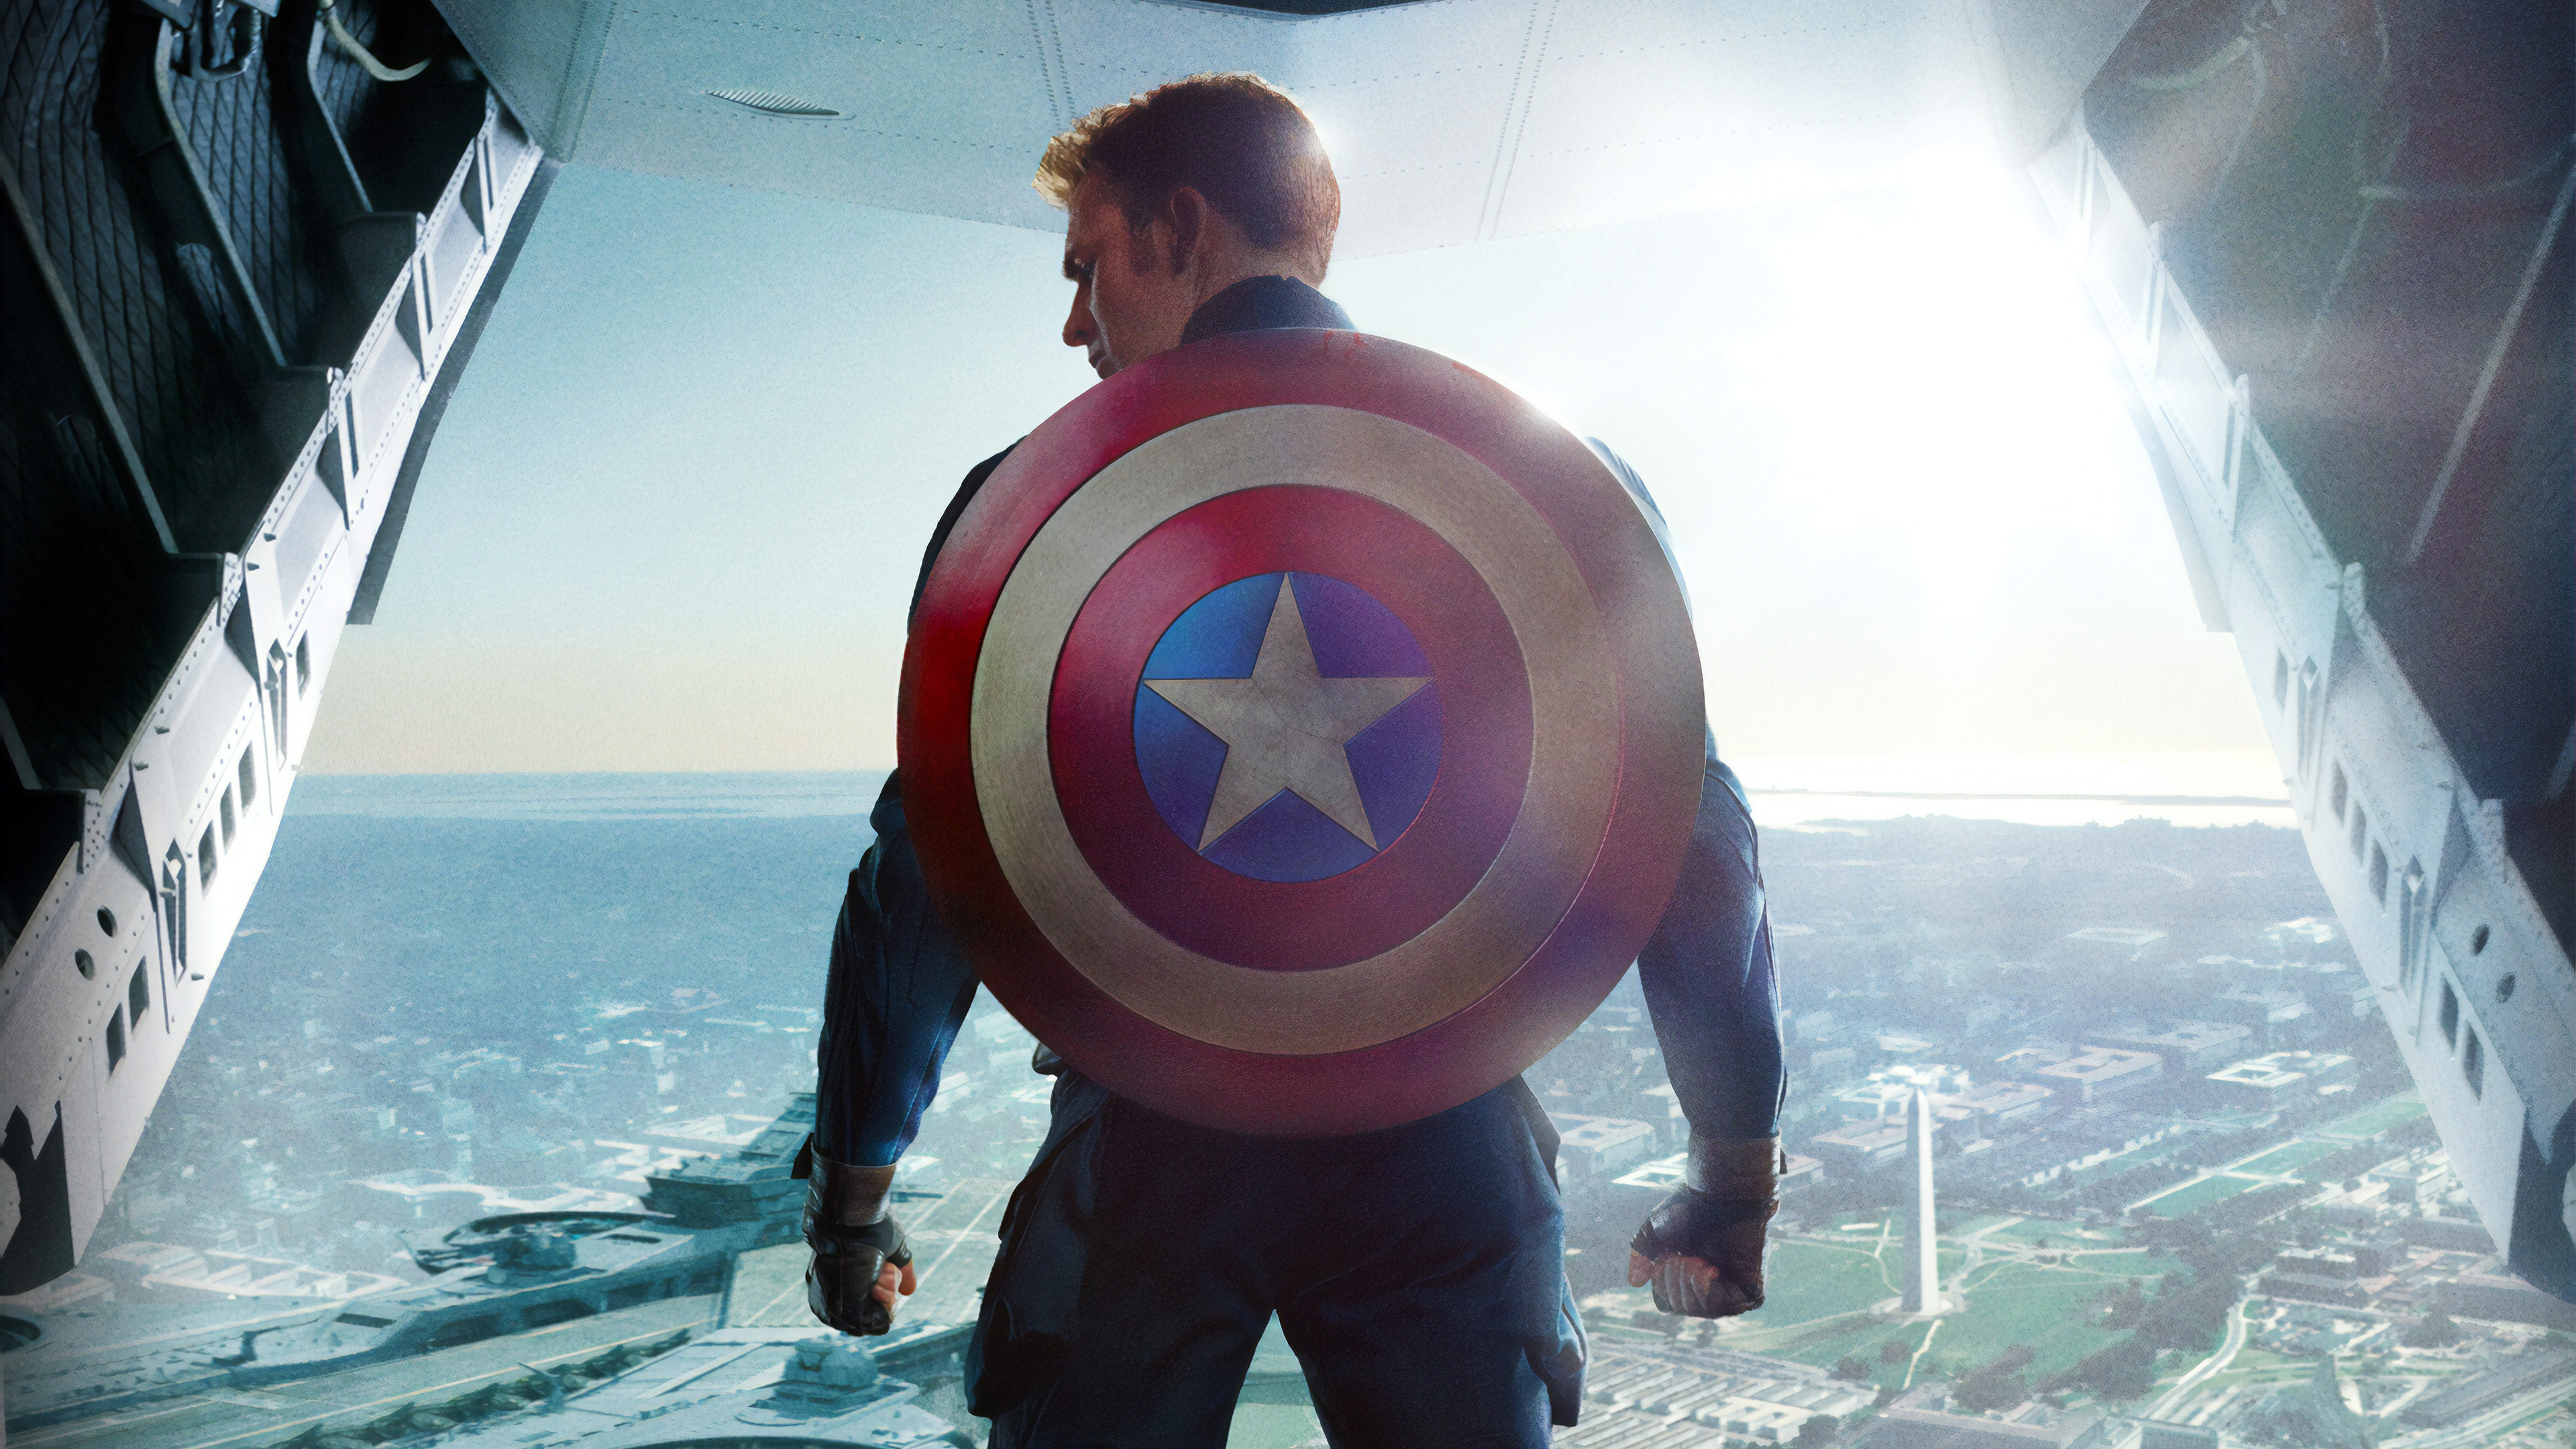 captain america 1562106226 - Captain America - superheroes wallpapers, hd-wallpapers, captain america wallpapers, 4k-wallpapers